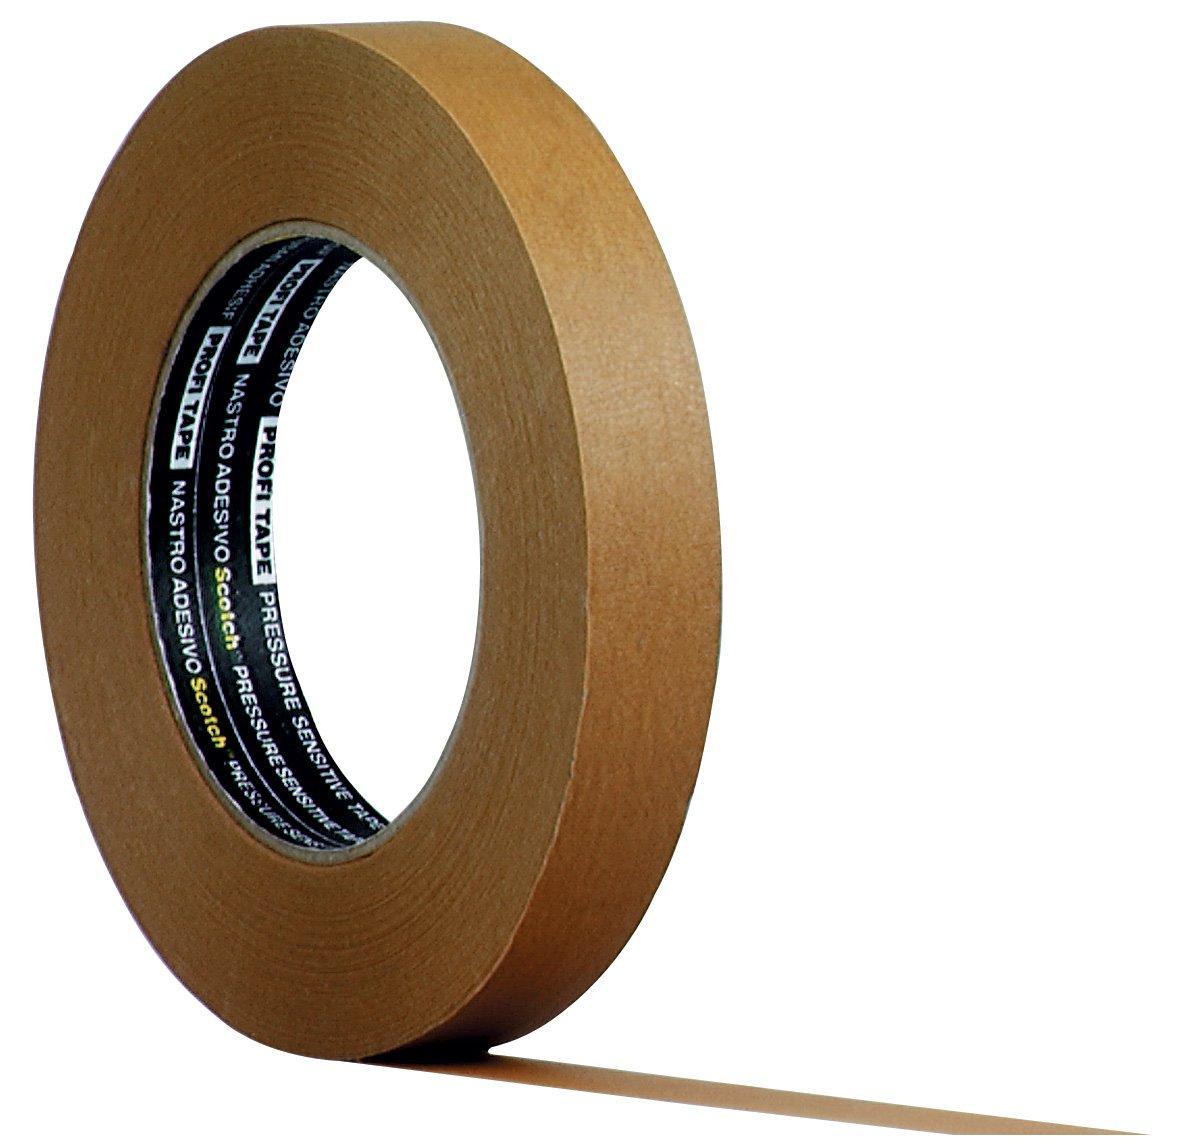 3M - 3430 Scotch Profi Tape 06750 (19mm, Lä nge 50m)